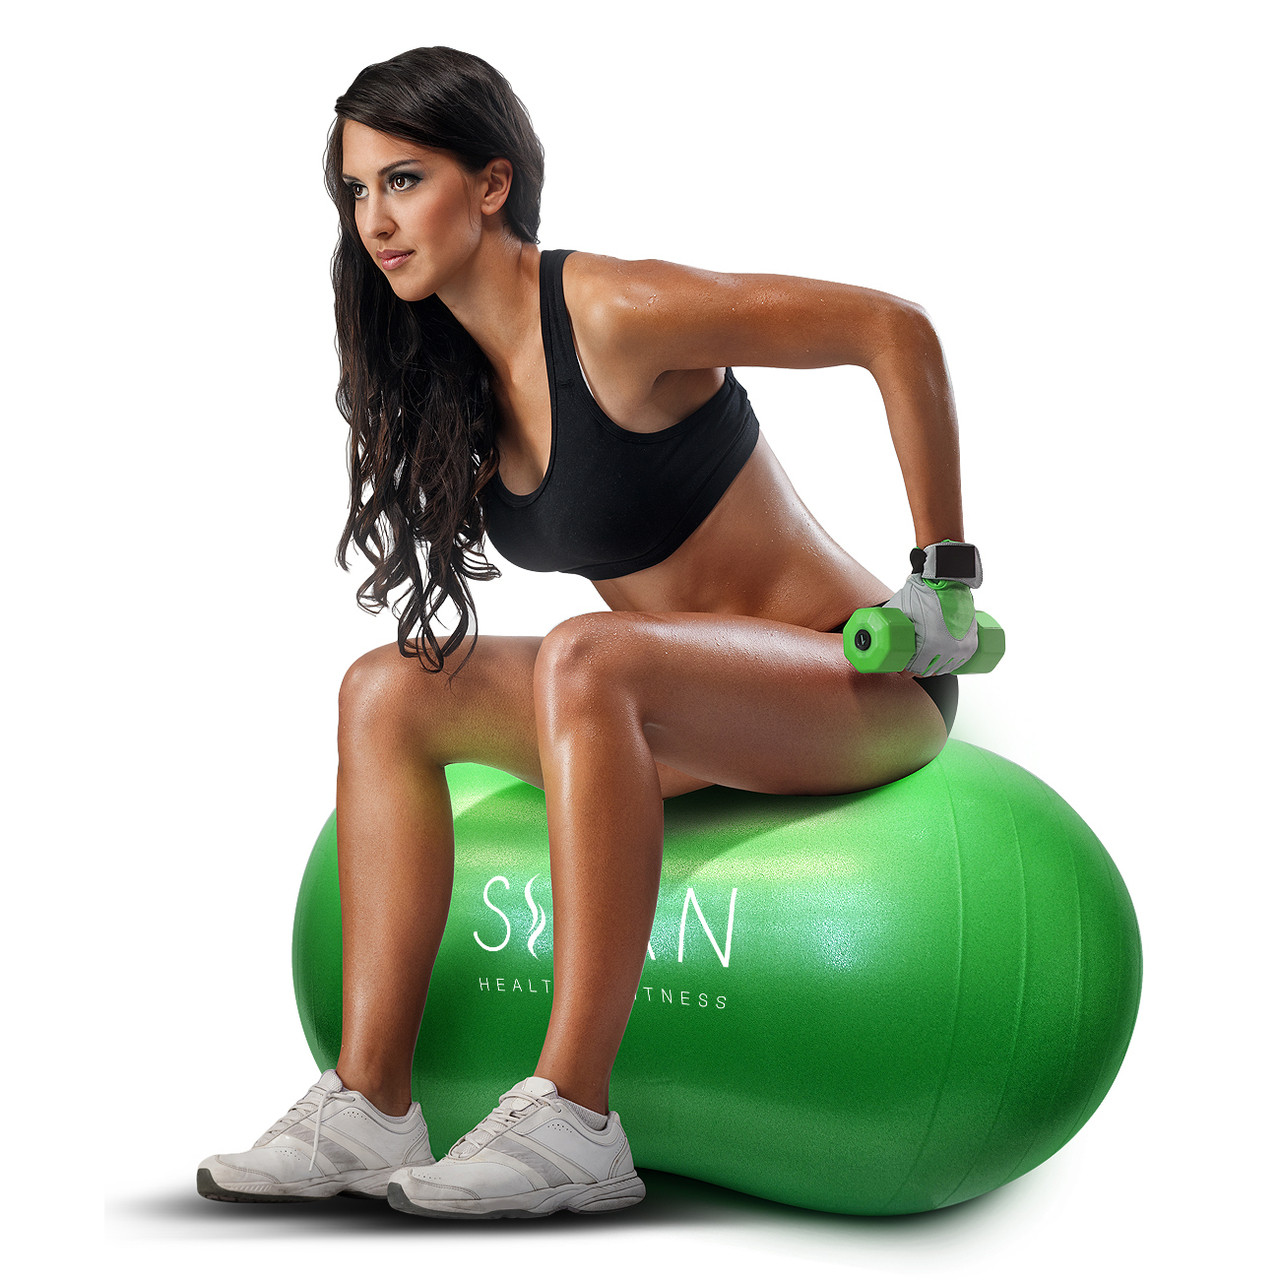 Sivan Health And Fitness Peanut Ball Gym Equipment 45cm X